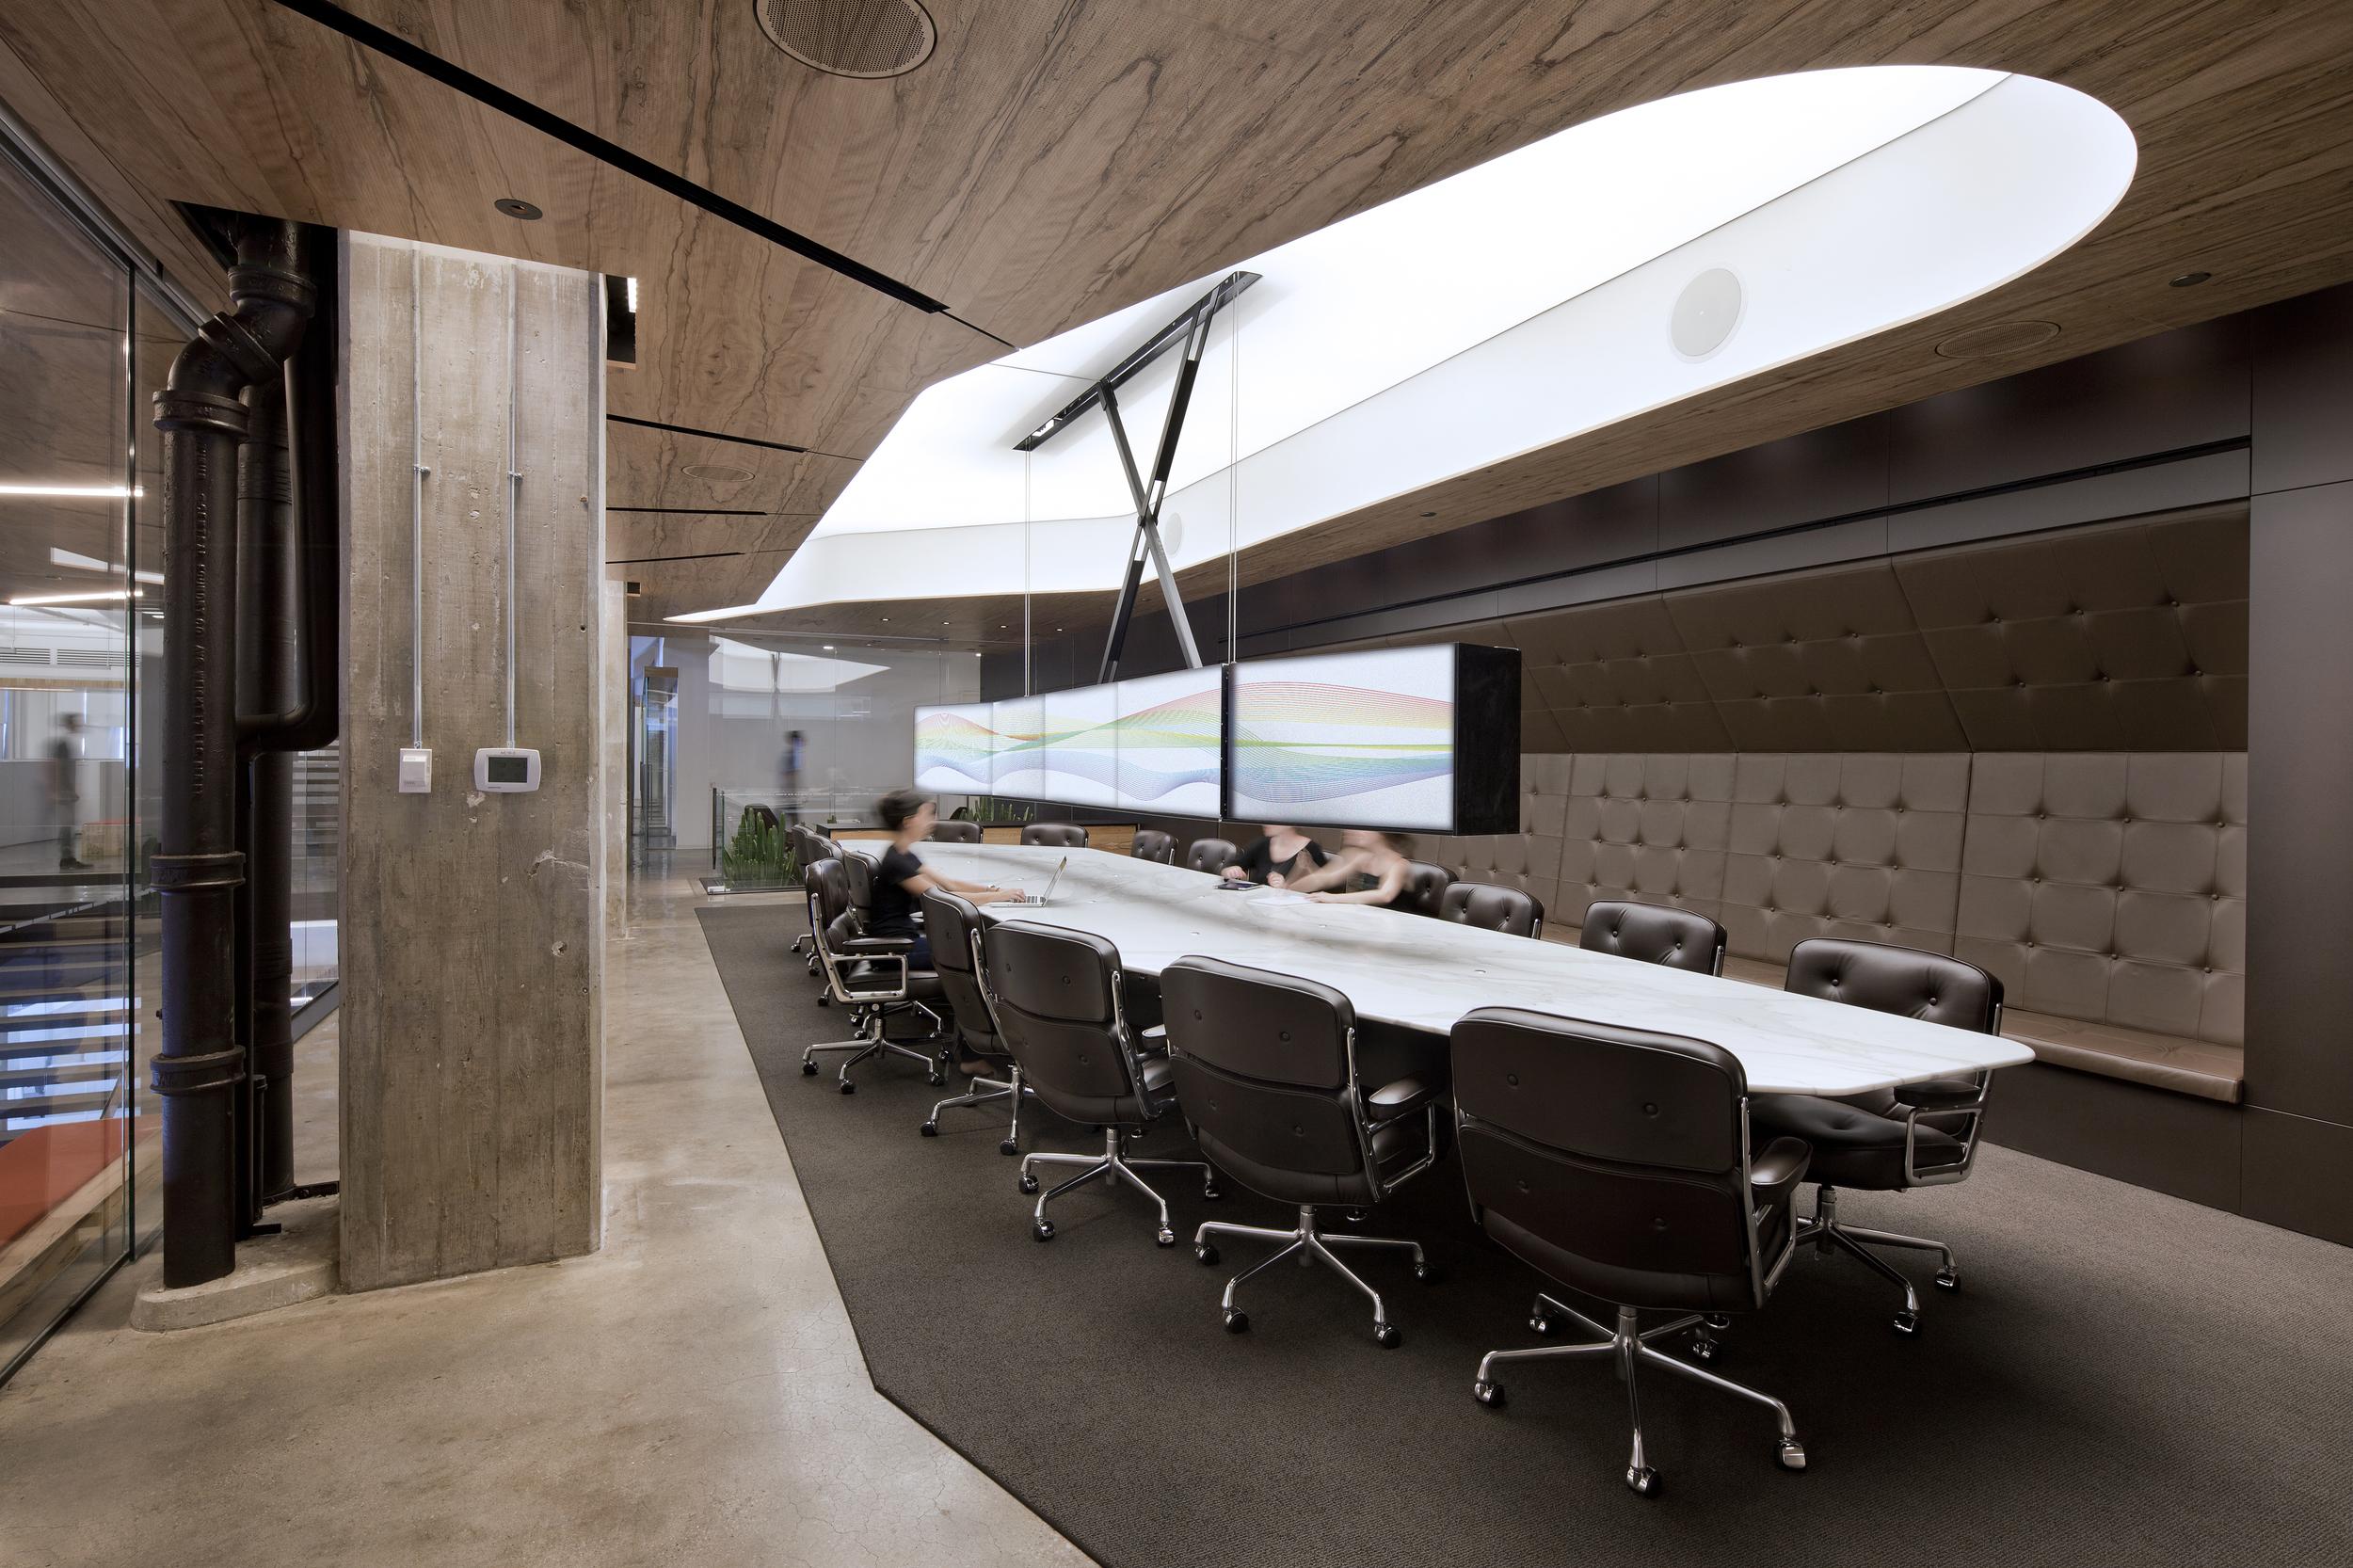 horizon media office. MB_Horizon_IMG_8582.2.jpg Horizon Media Office